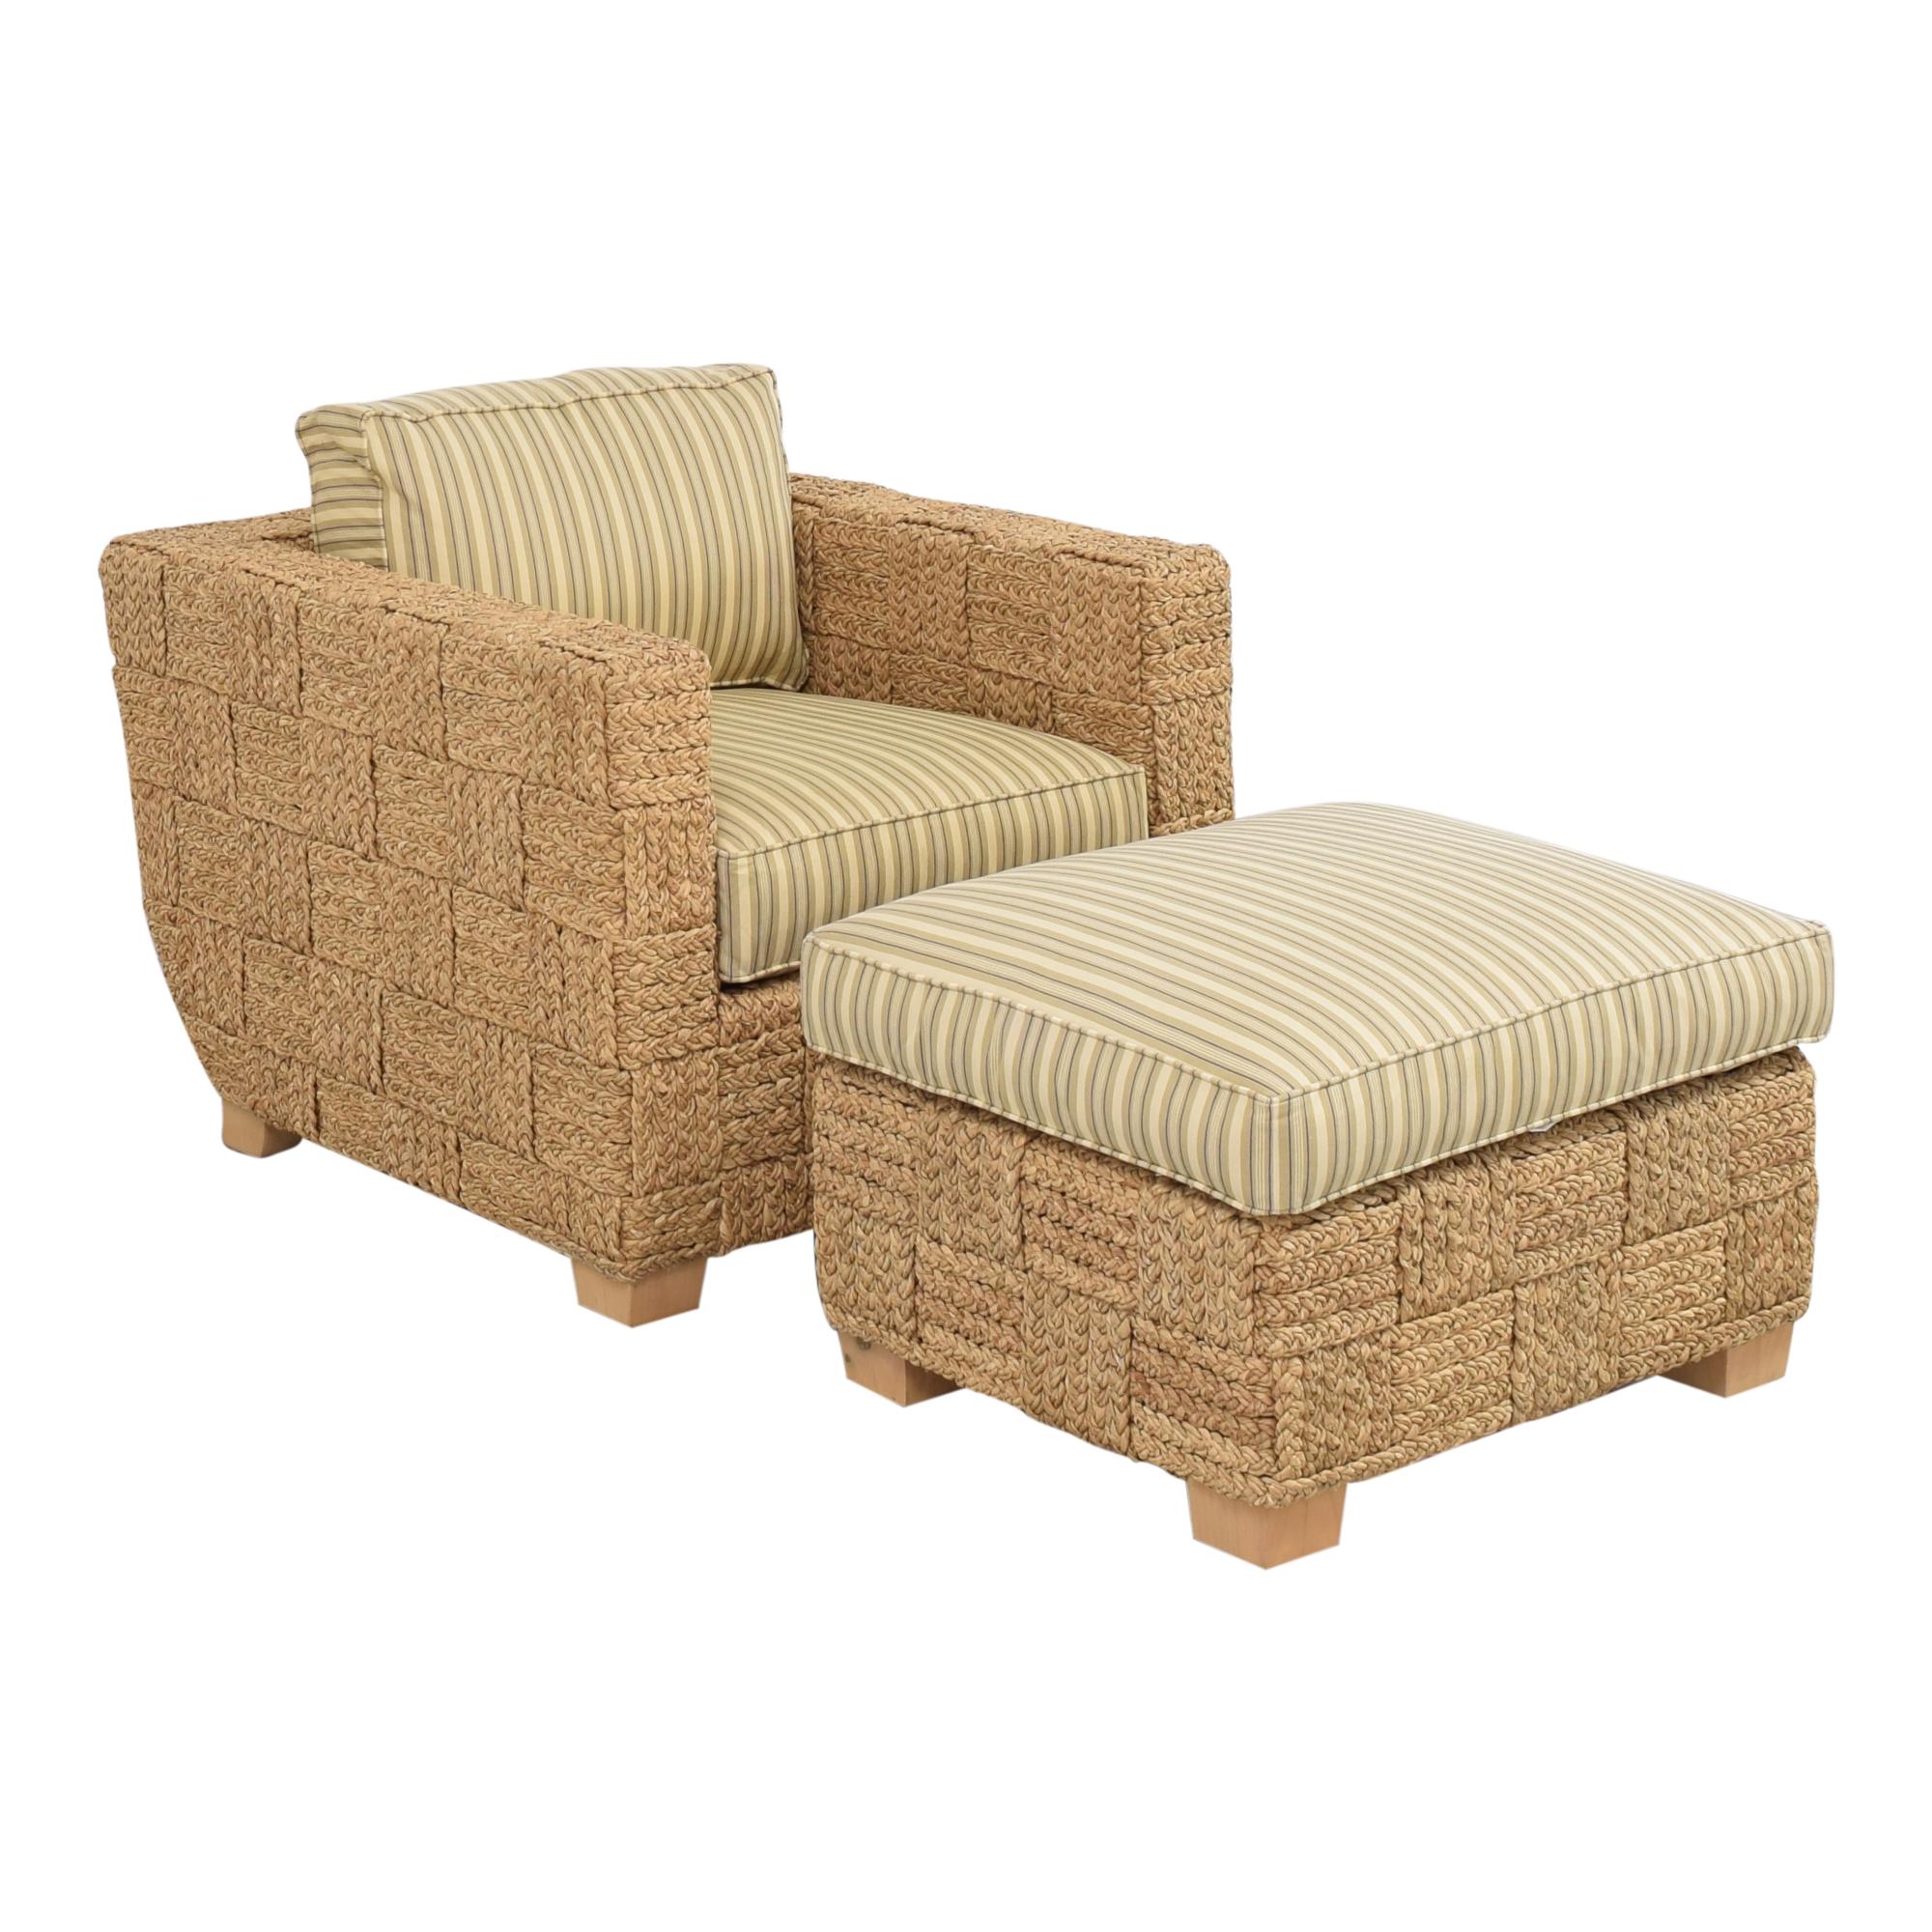 buy Ralph Lauren Home Accent Chair with Ottoman Ralph Lauren Home